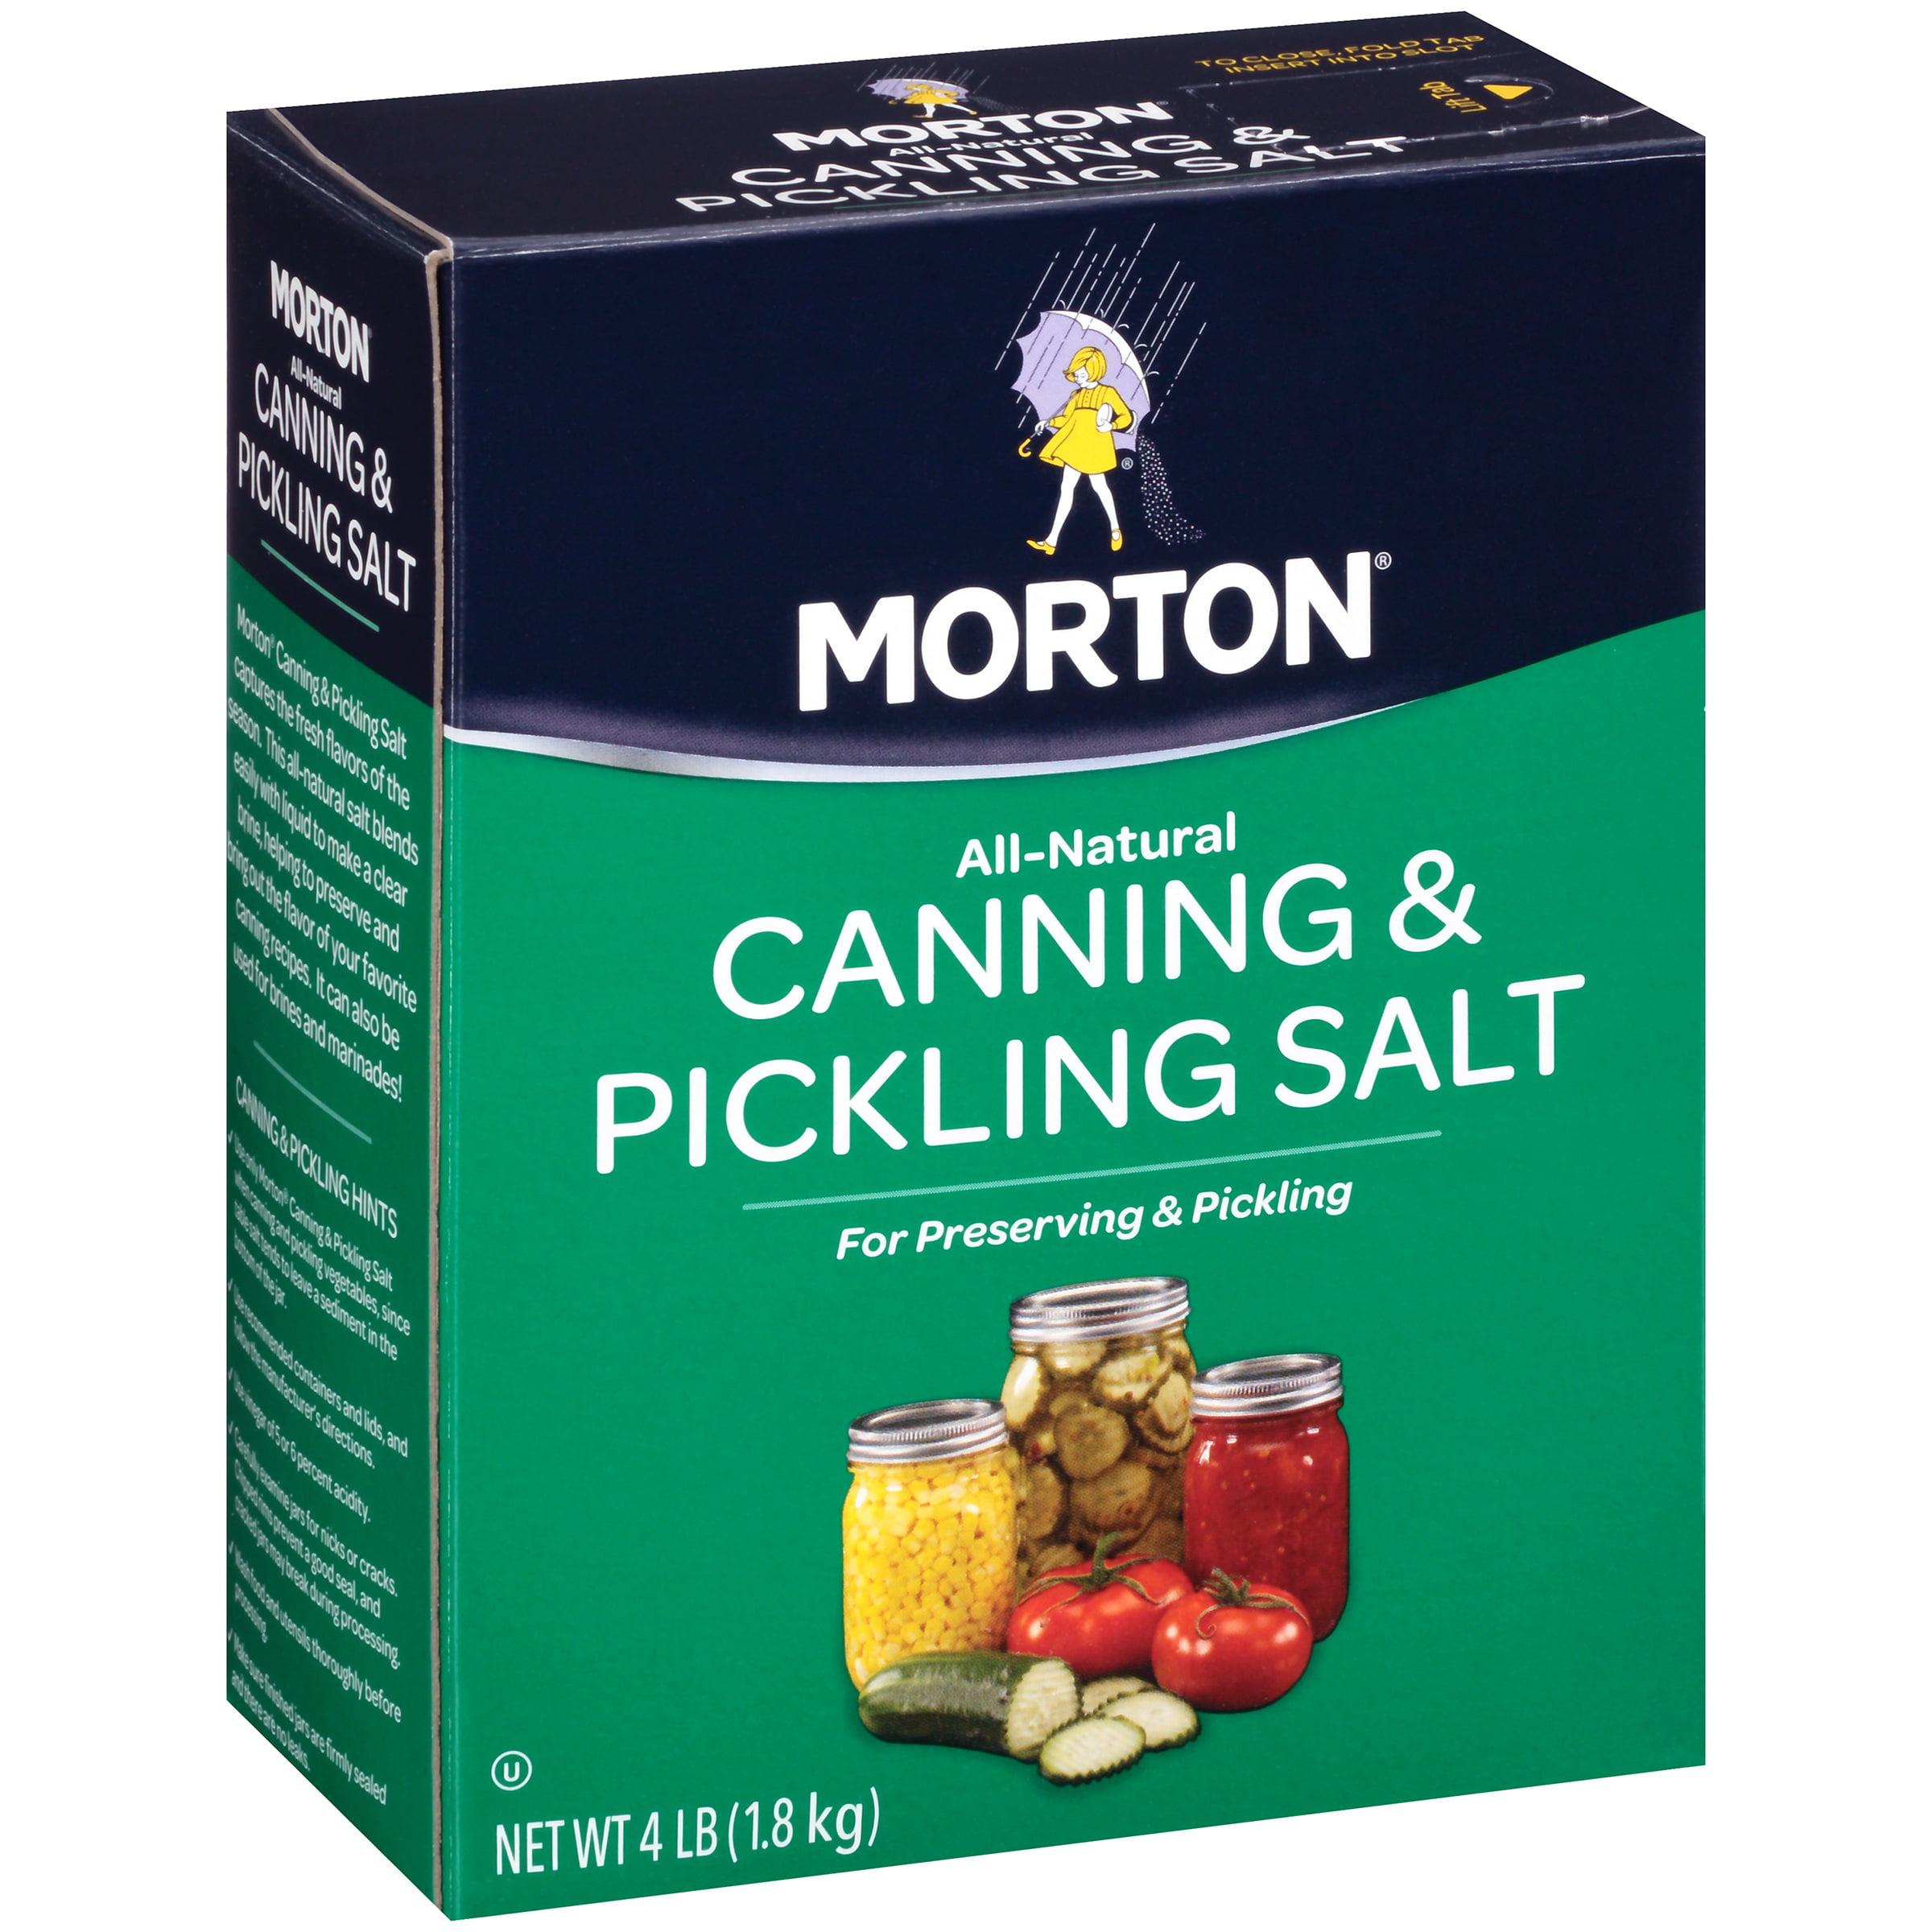 Morton Canning & Pickling Salt , 4 lbs by Morton Salt, Inc.